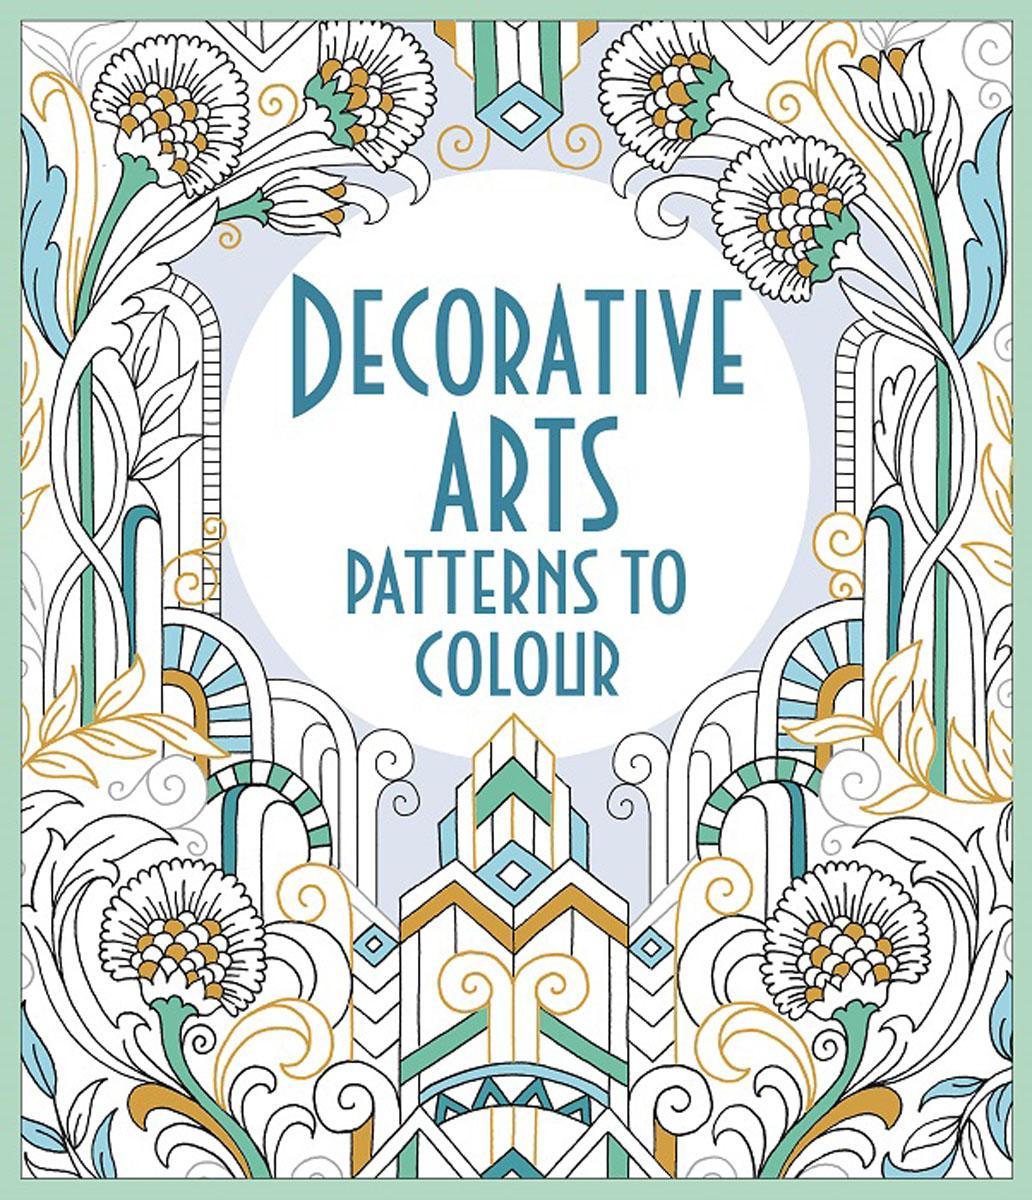 Decorative Arts Patterns to Colour roman patterns to colour